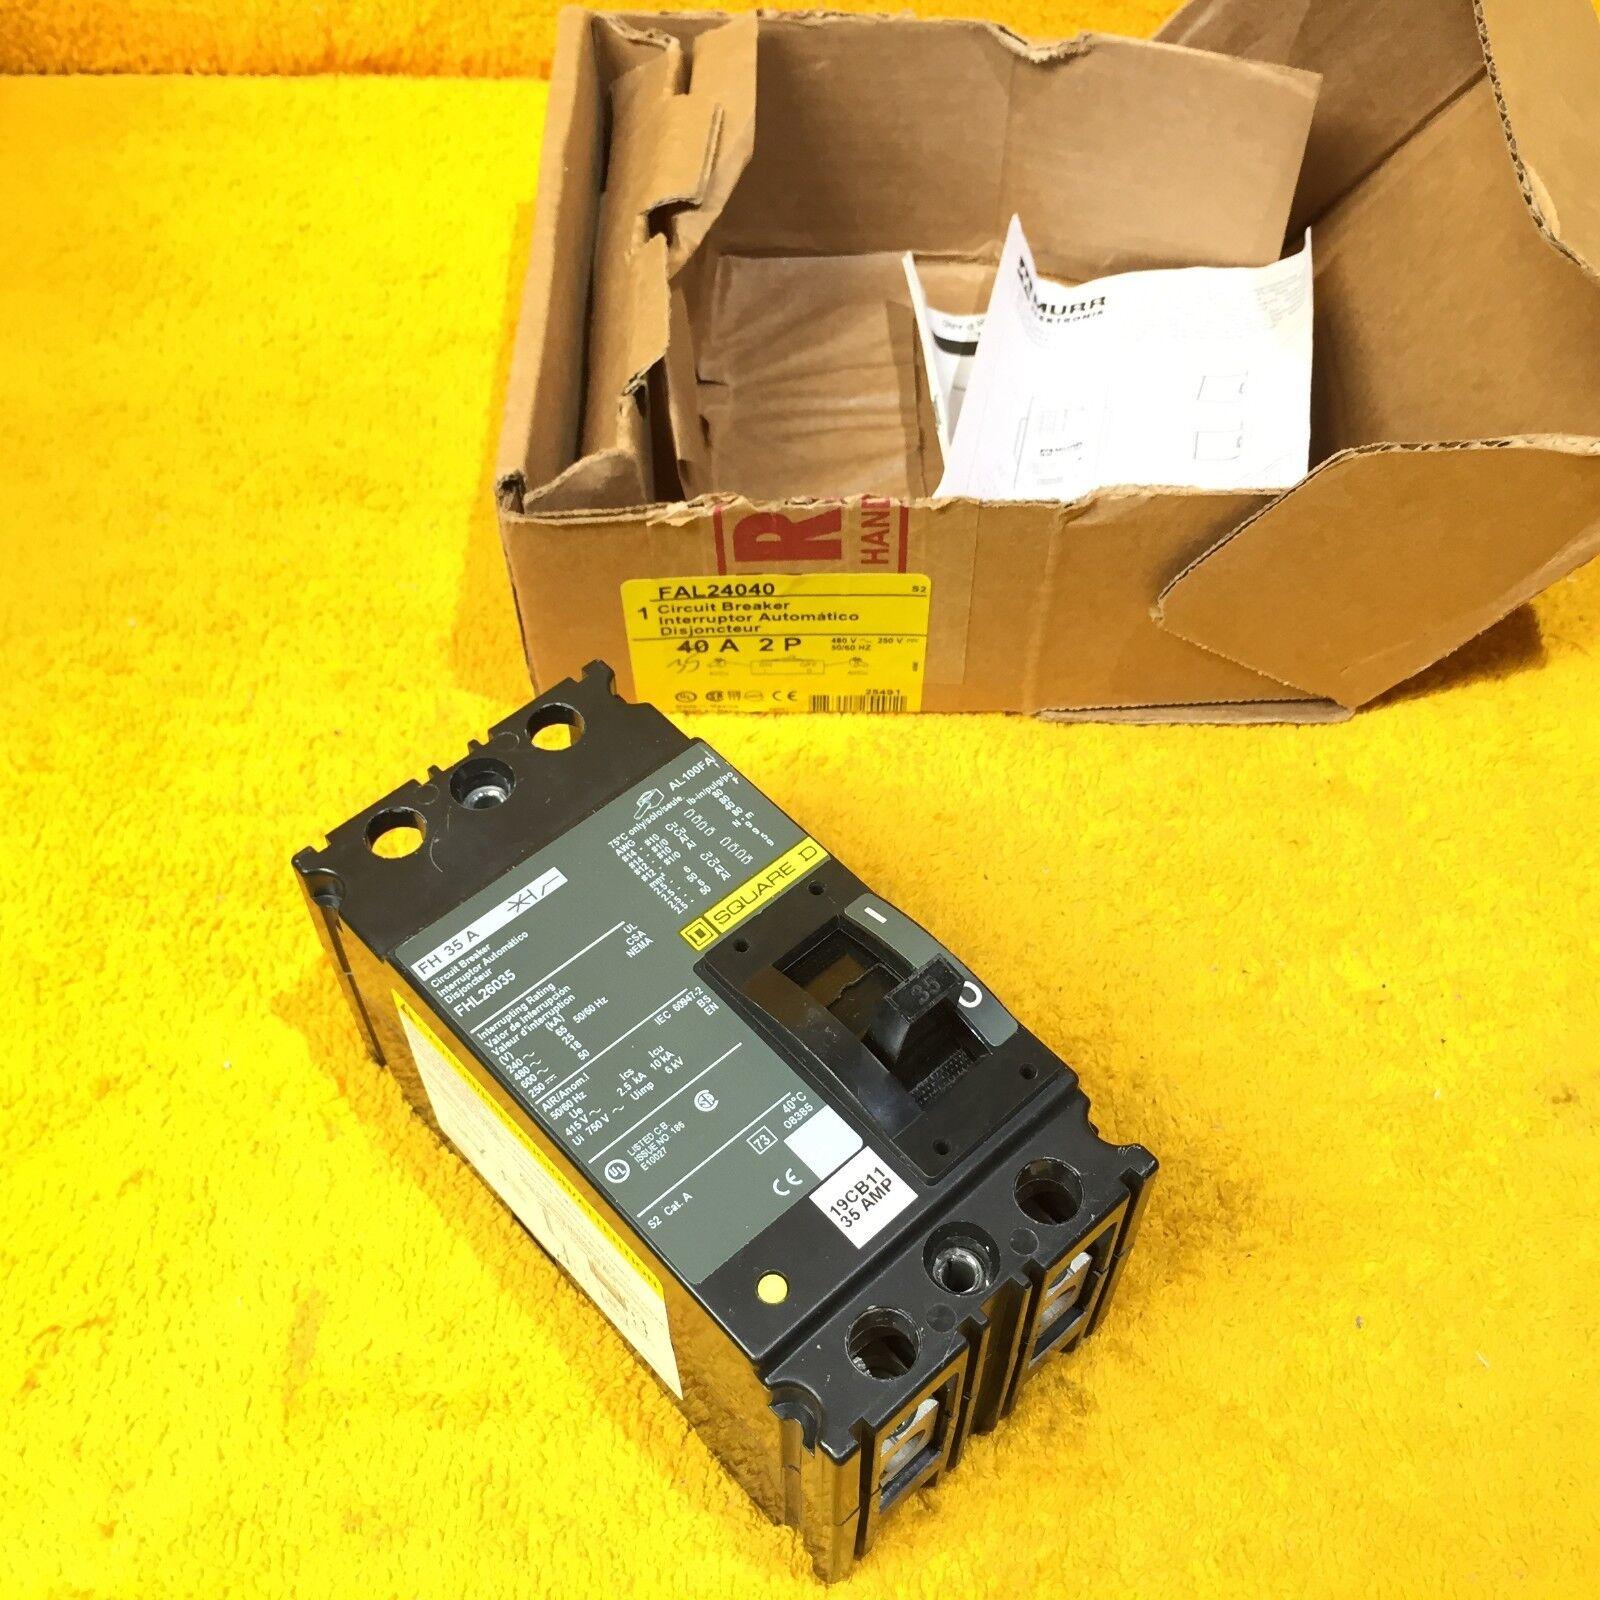 * SQUARE D  35 AMP 2 POLE 600V  CIRCUIT BREAKER  FHL26035 ....... WA-126